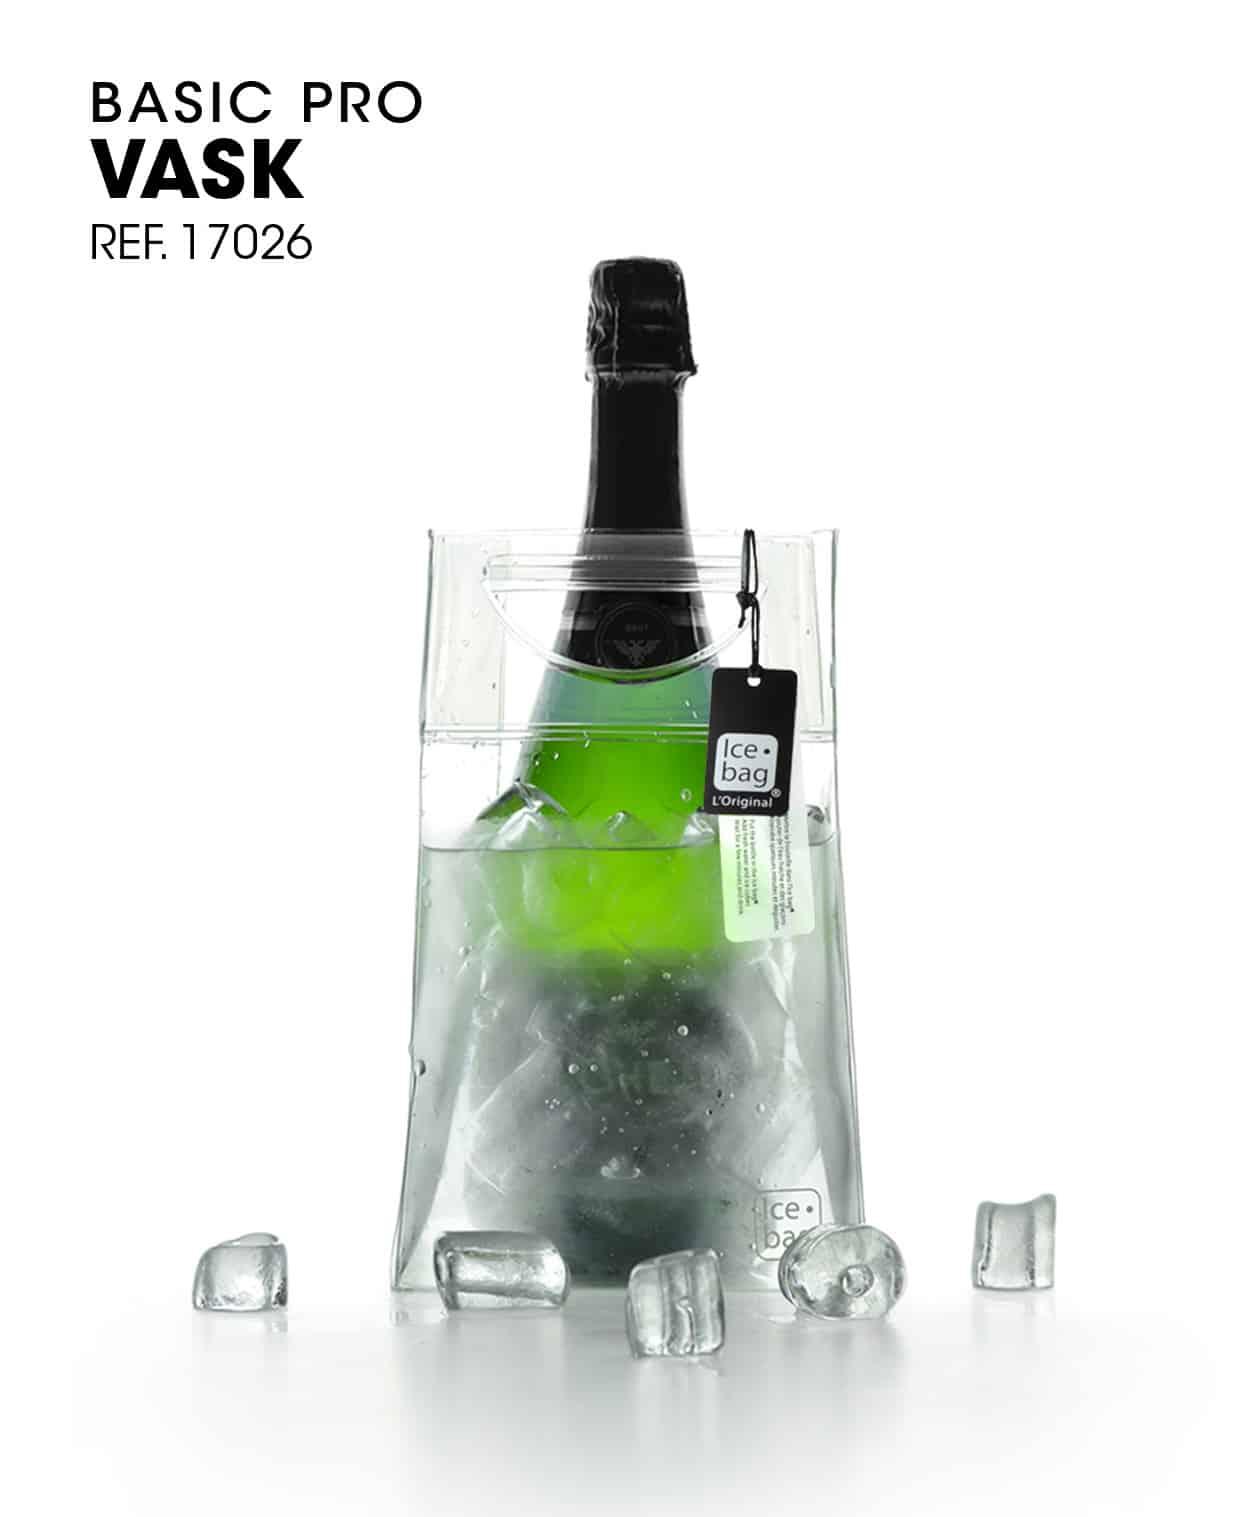 Sac à glaçon Basic Pro Vask